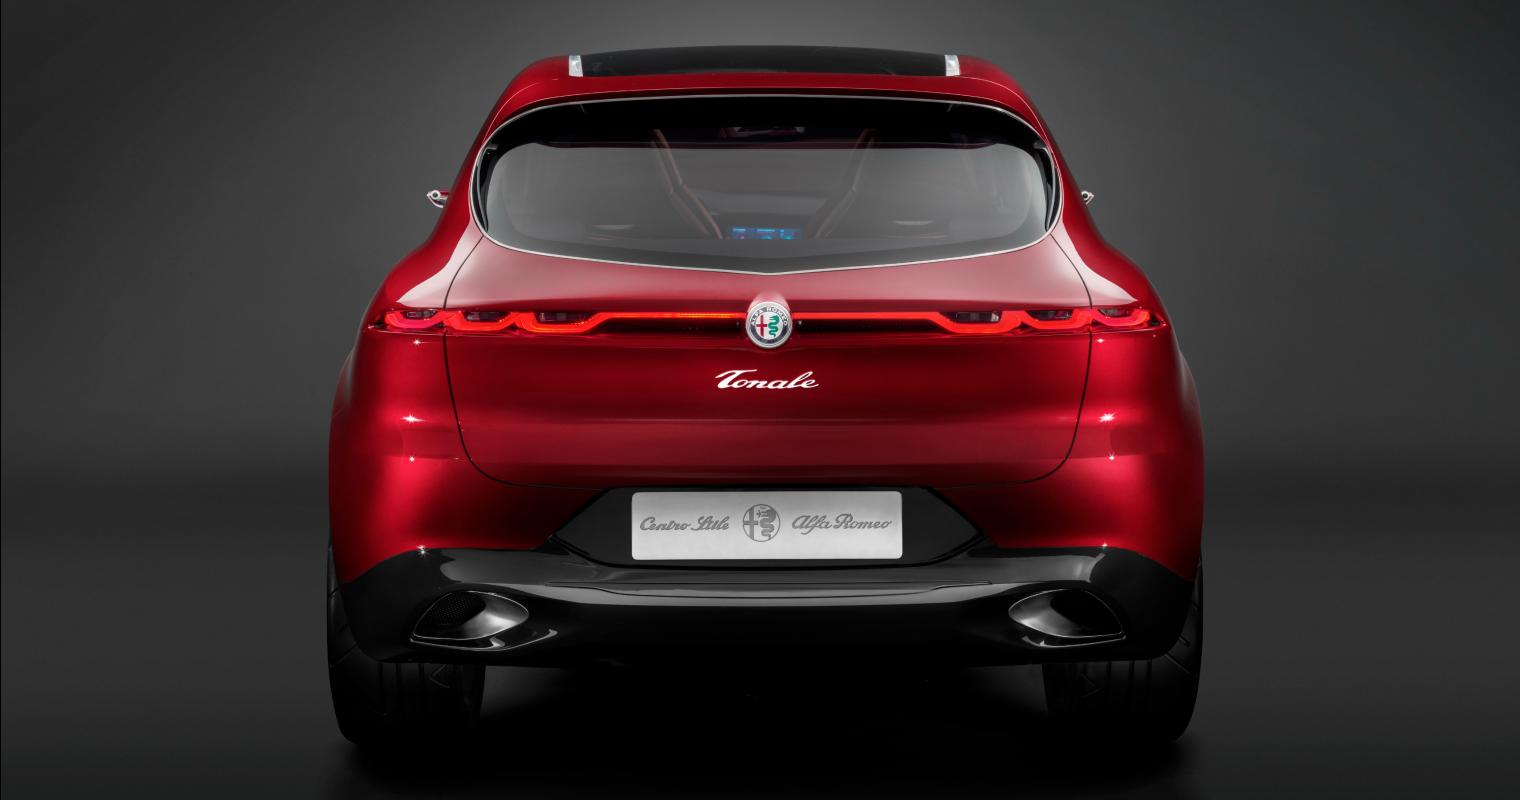 Retro nuova Alfa Romeo Tonale